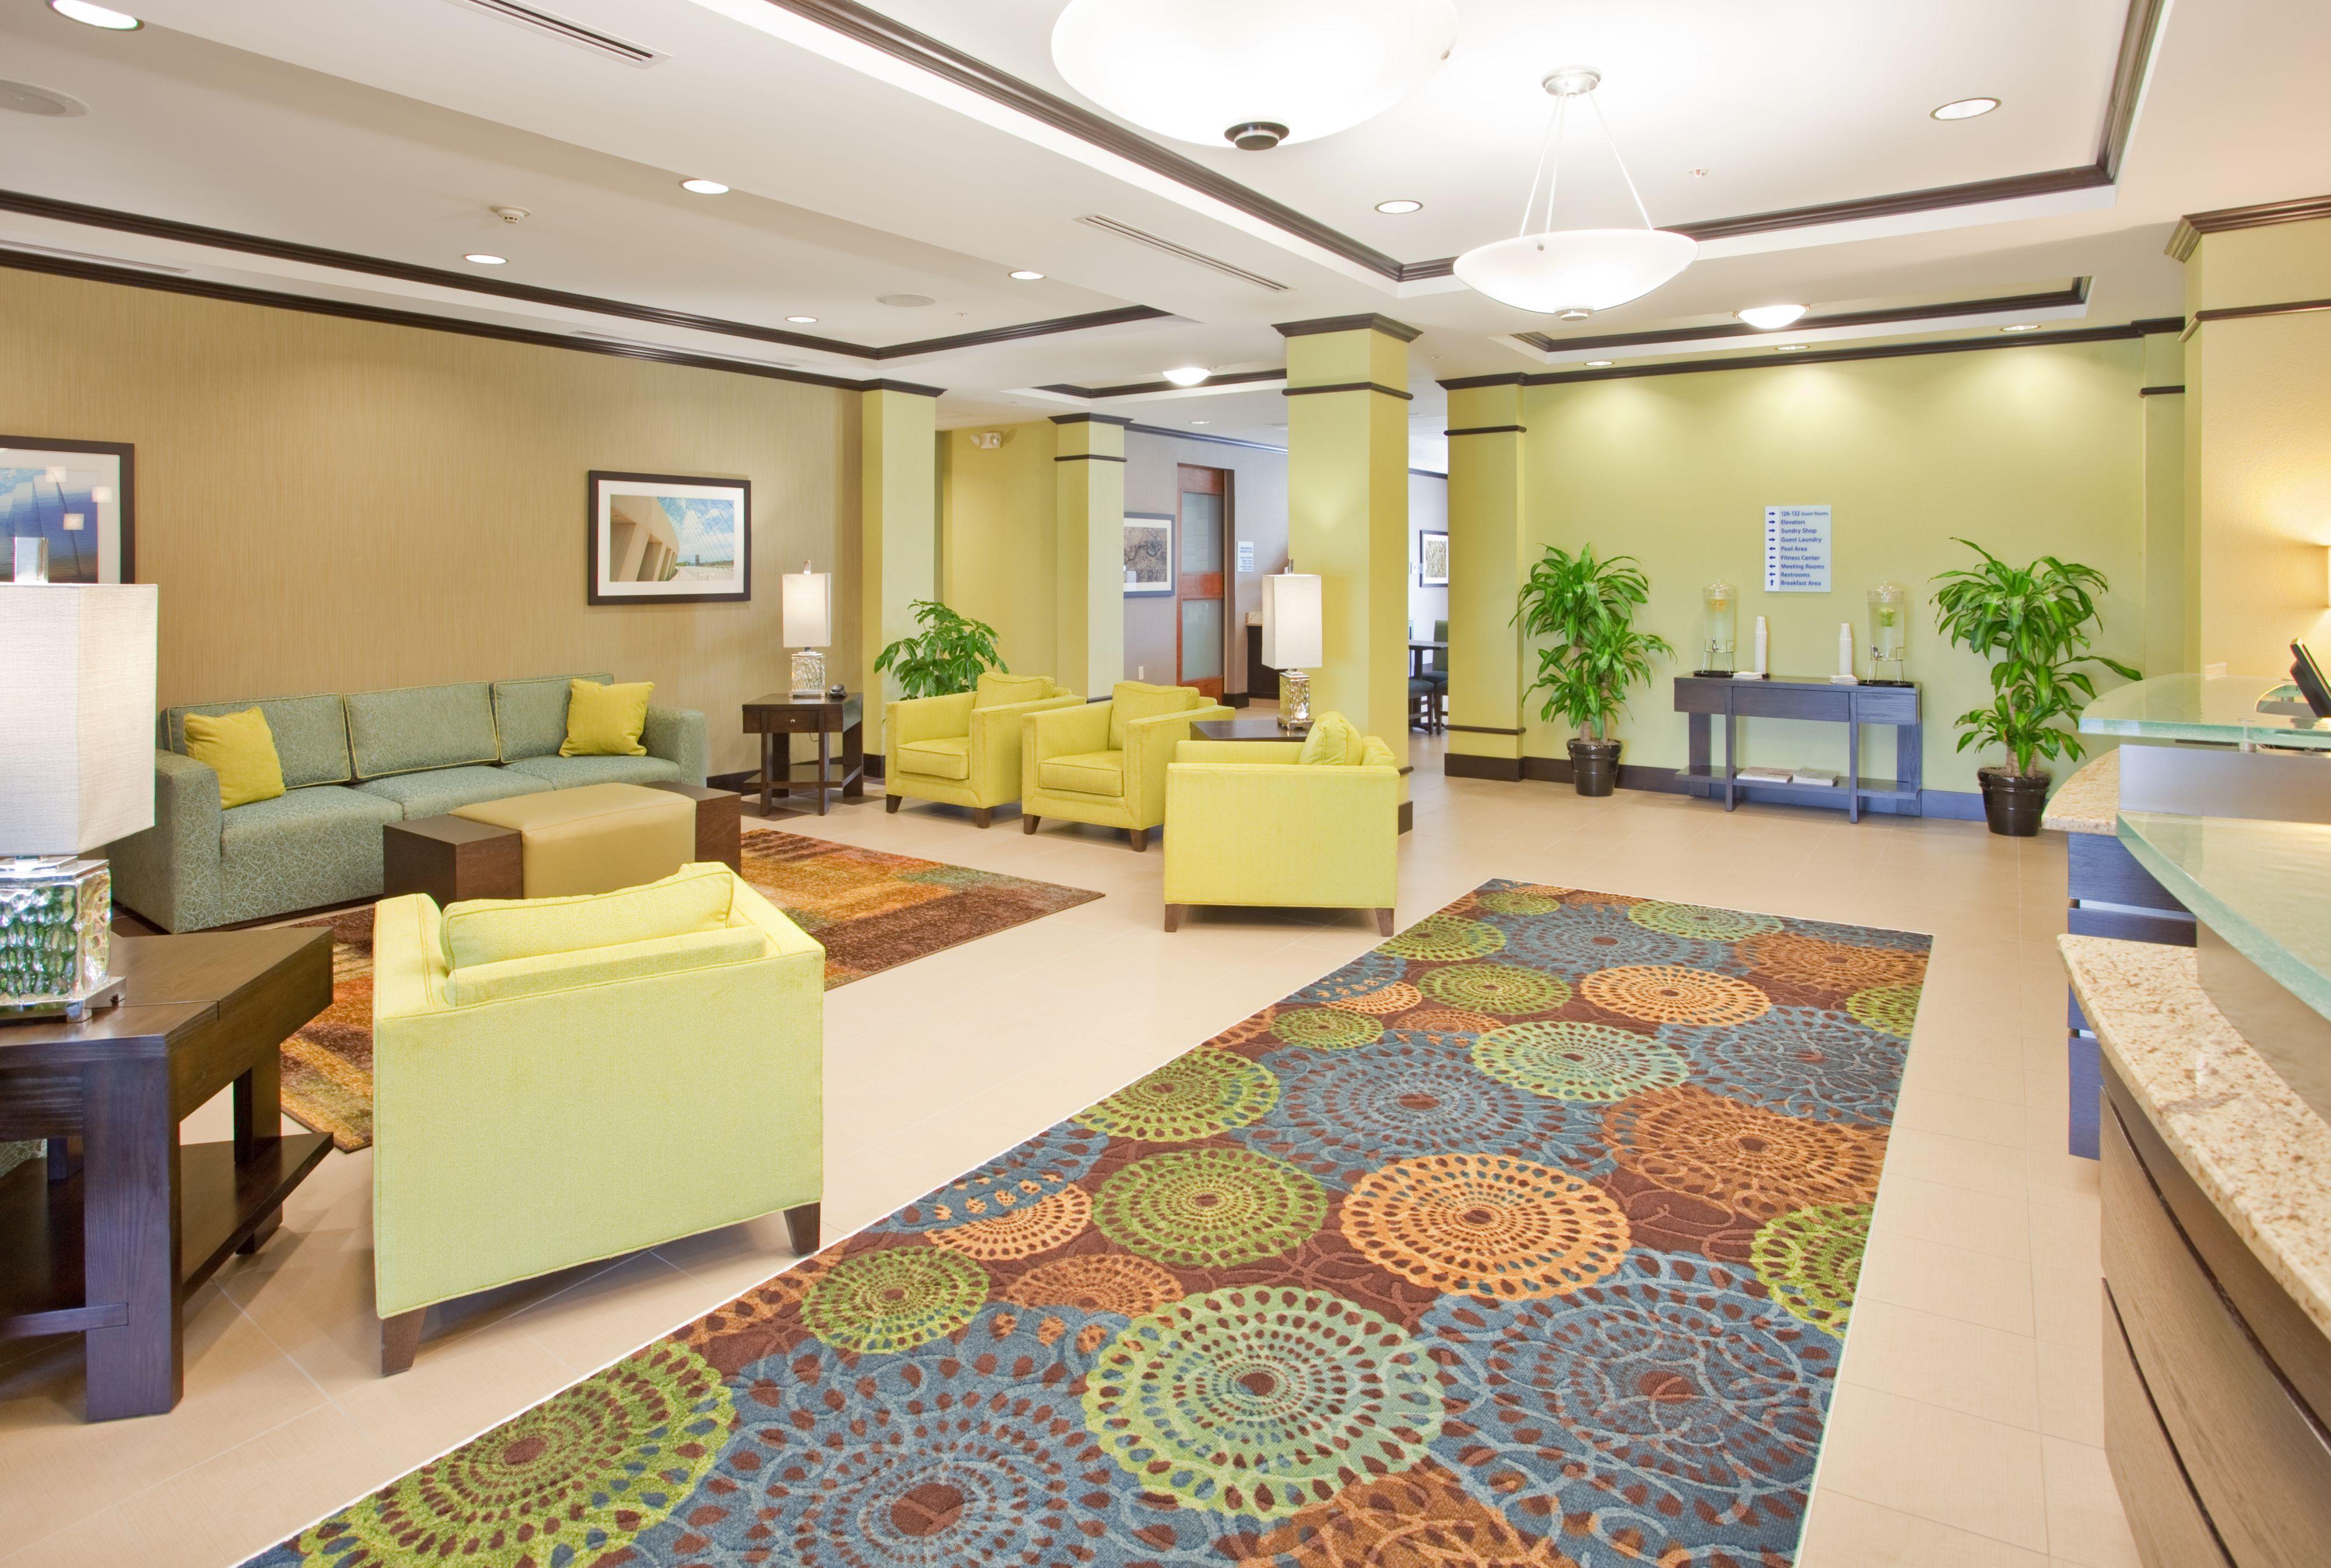 Holiday Inn Express & Suites St. Joseph image 3